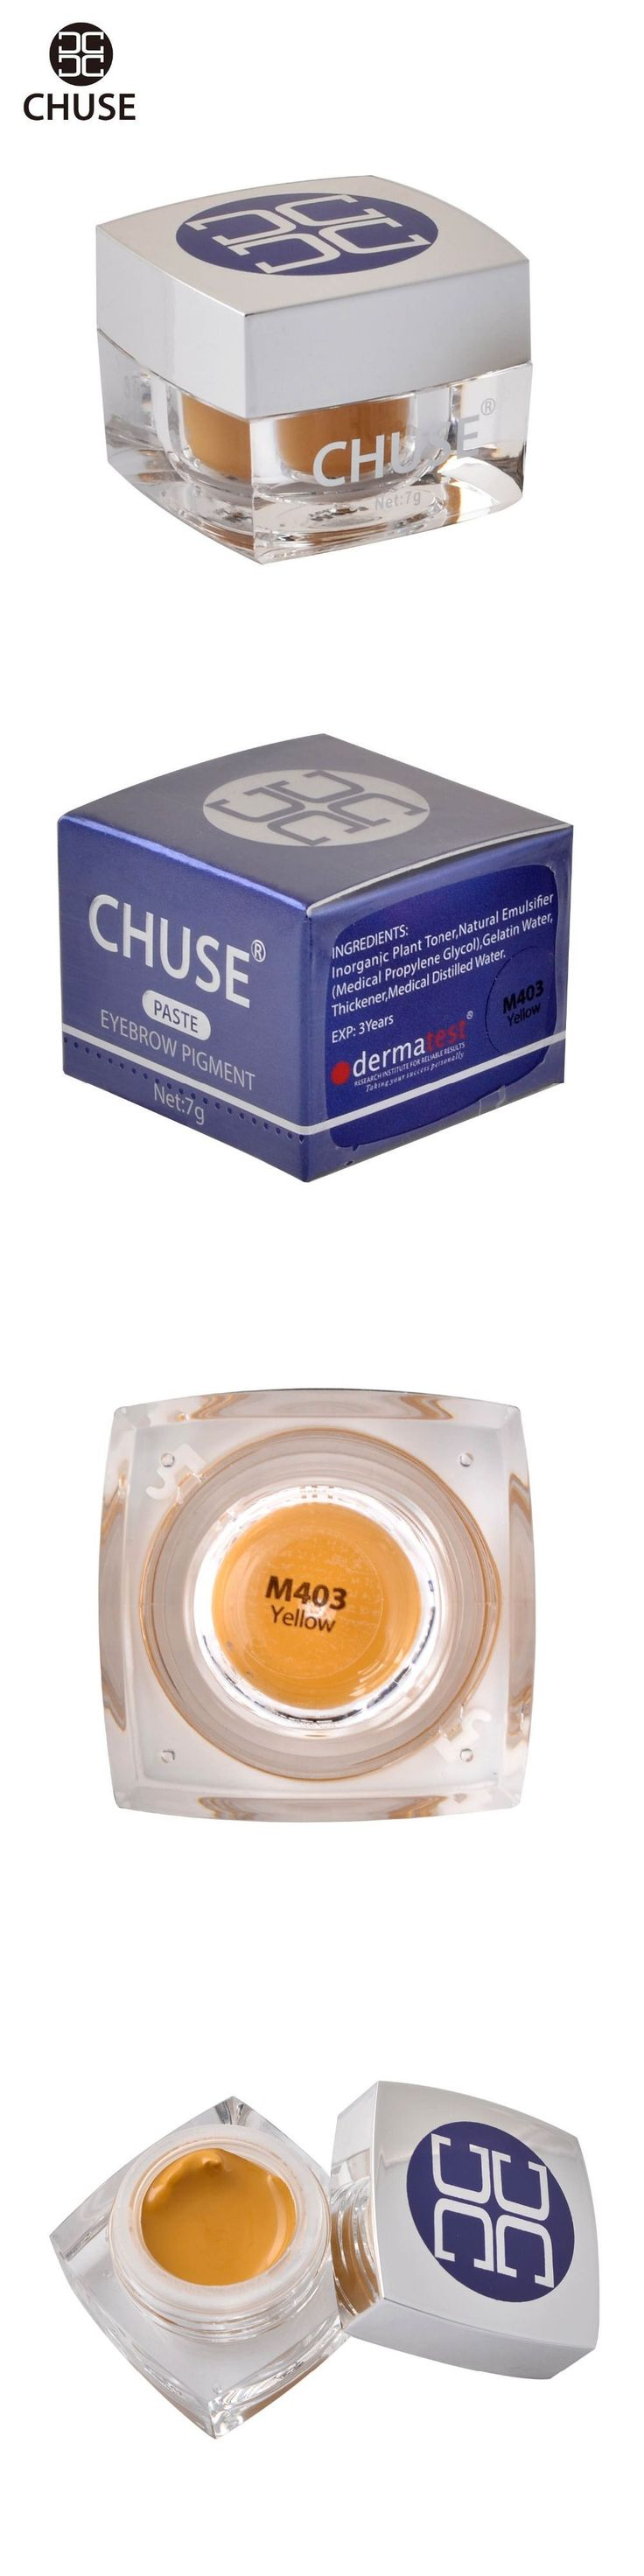 CHUSE Semi-Permanent Make-up Color Cream  Eyebrow Eyeliner Eye Shadow M403 Eyeliner Yellow